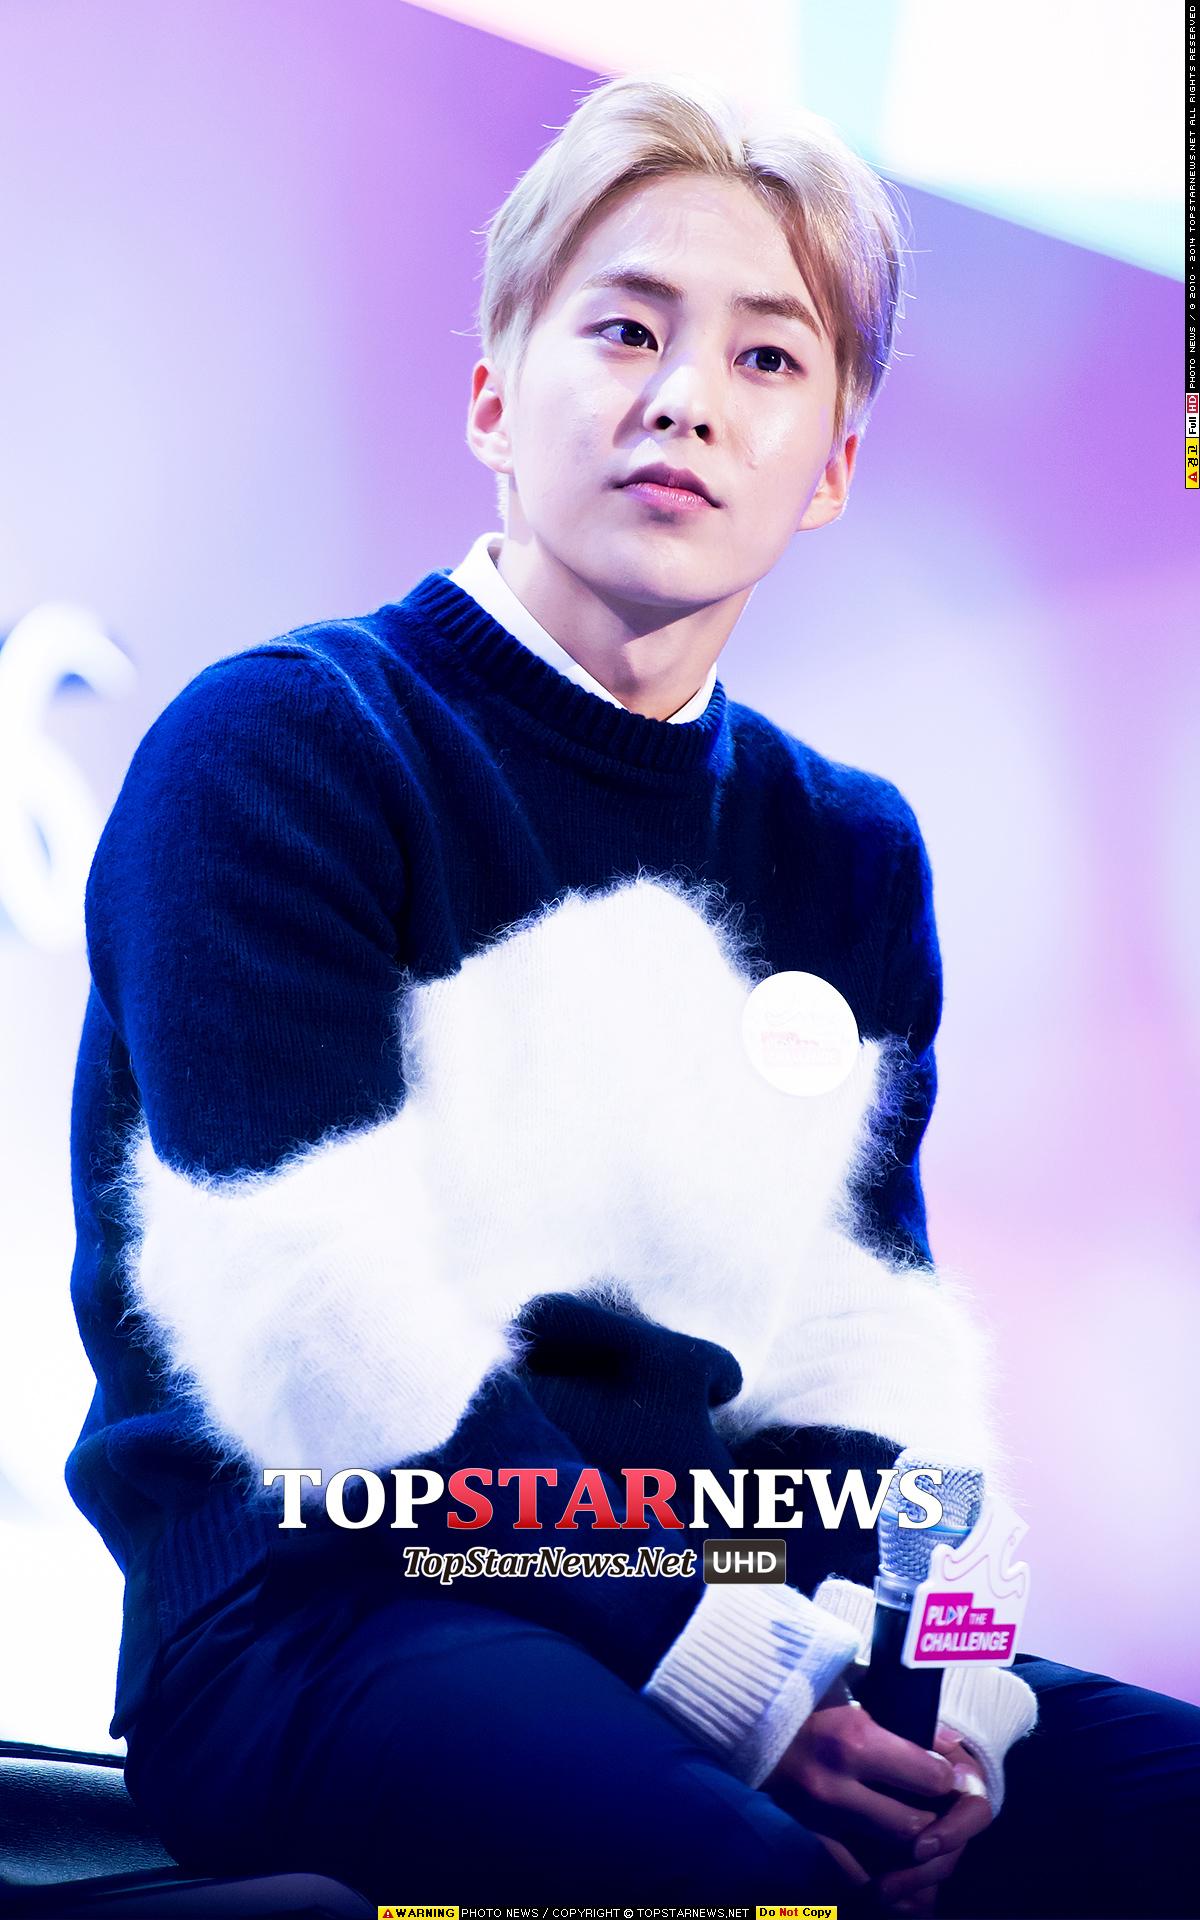 EXO Xiumin 「原本EXO行星是無法自己發光的,因為有著叫做EXO-L的星星,行星才能發出光芒,以後也繼續讓它發光吧!」